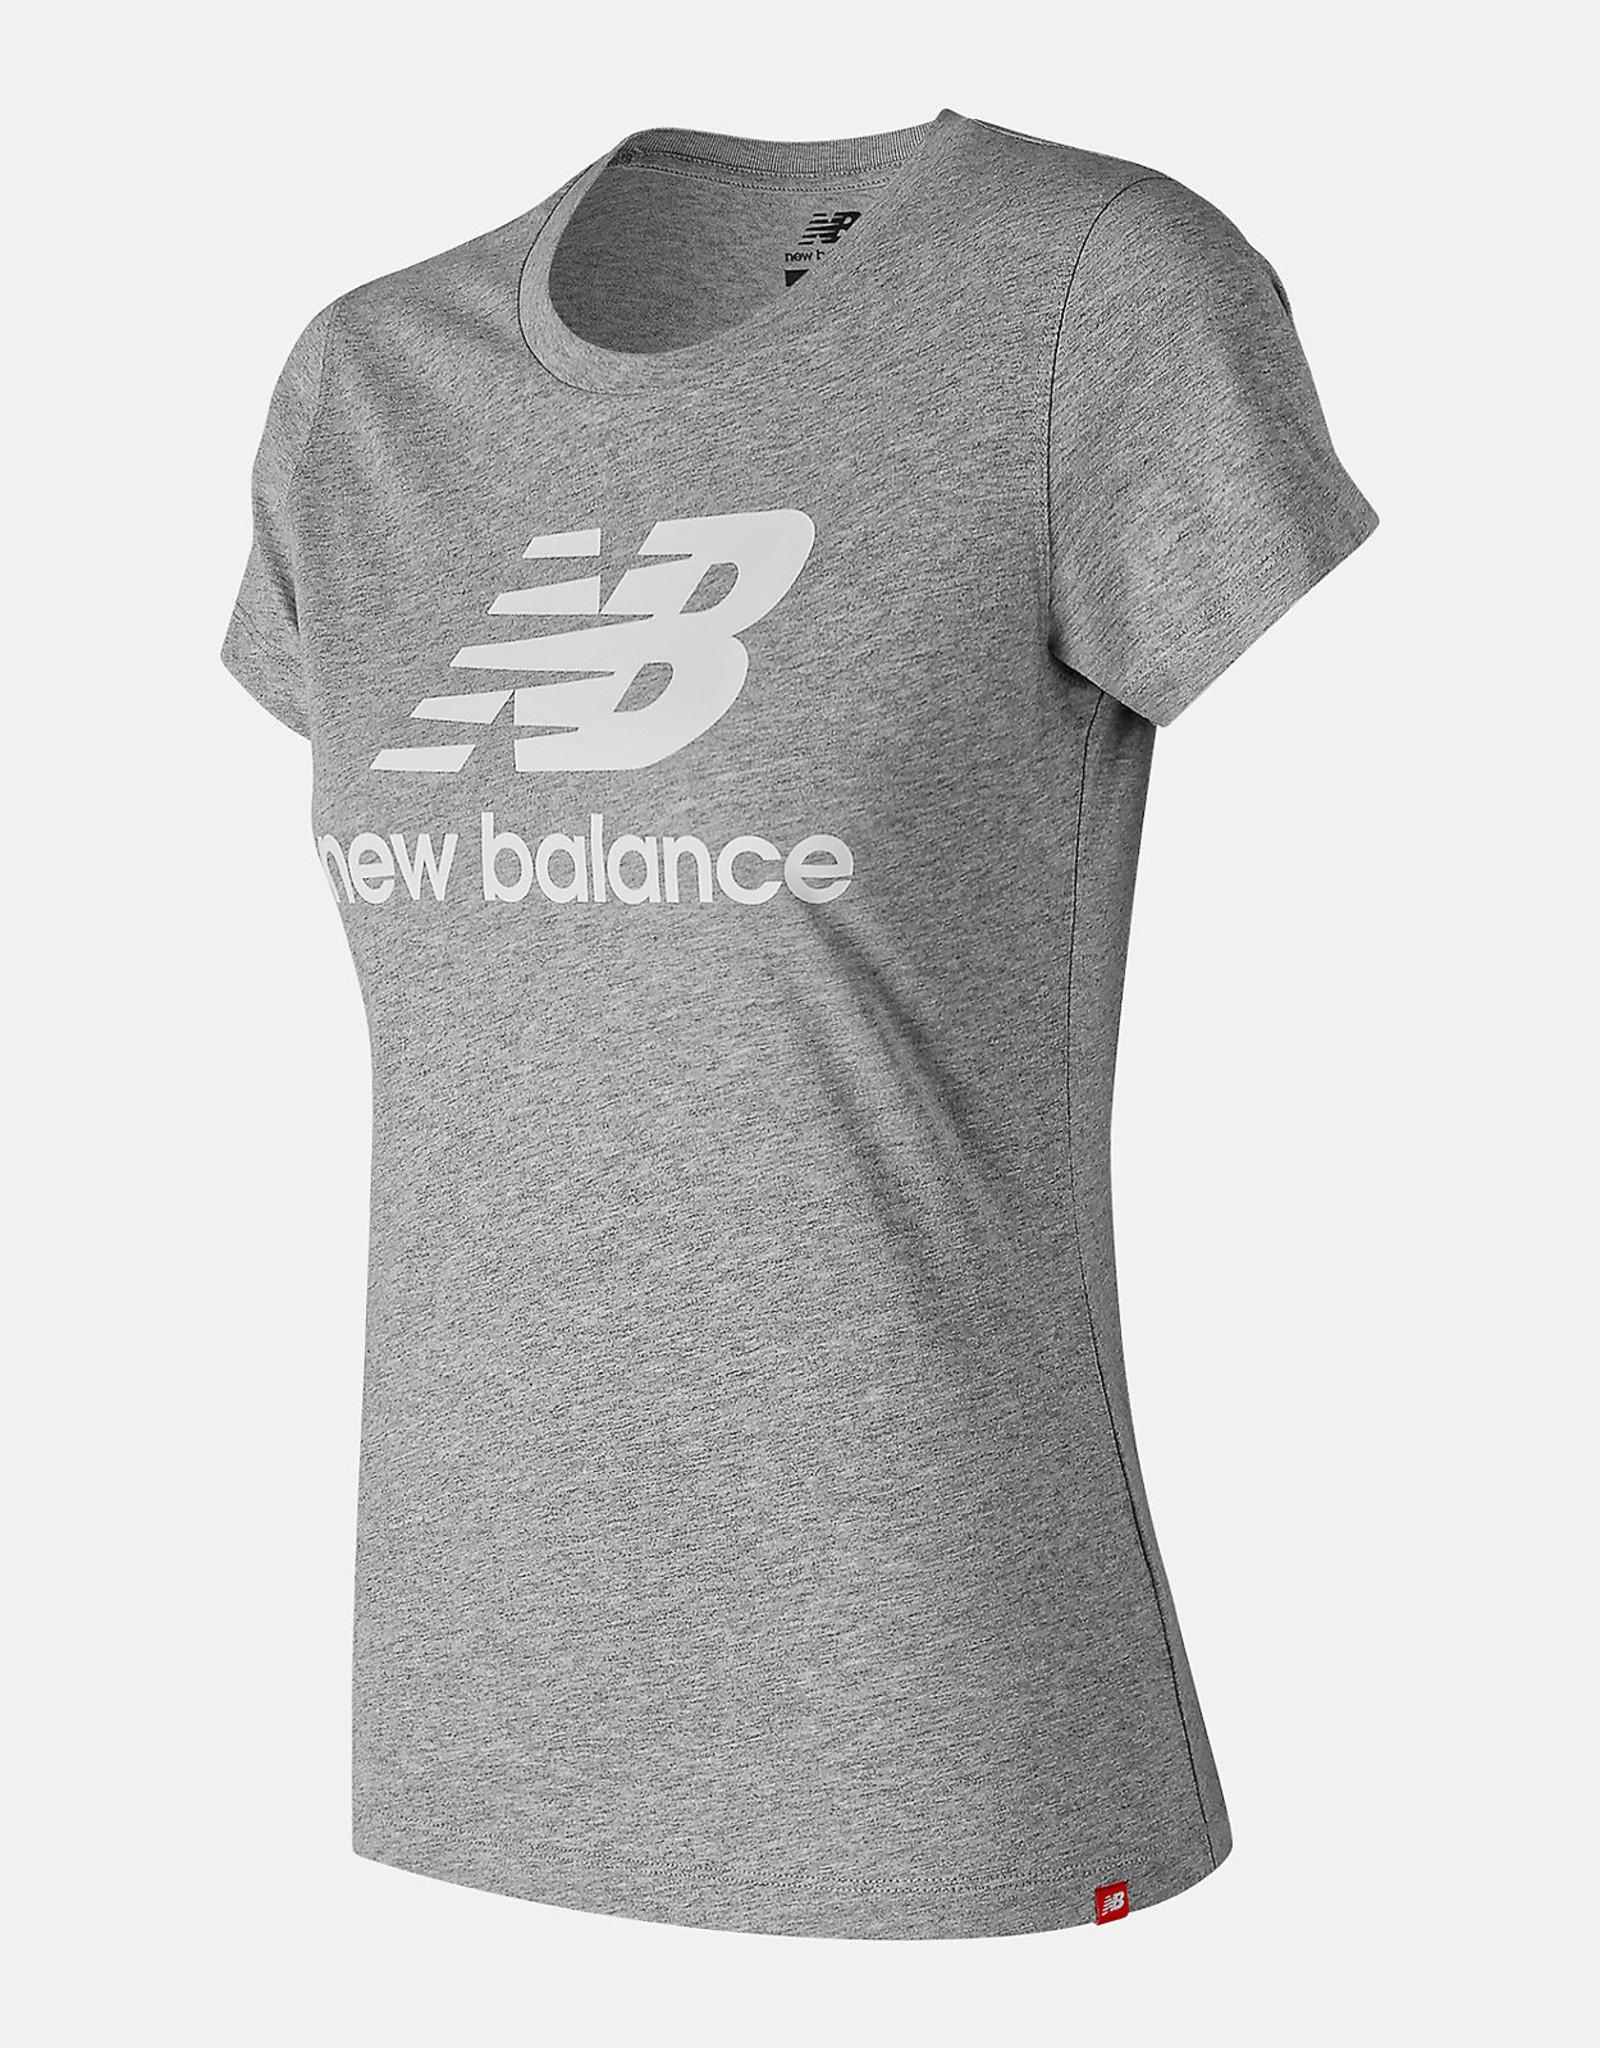 new balance ESS ST LOGO TEE WT91546